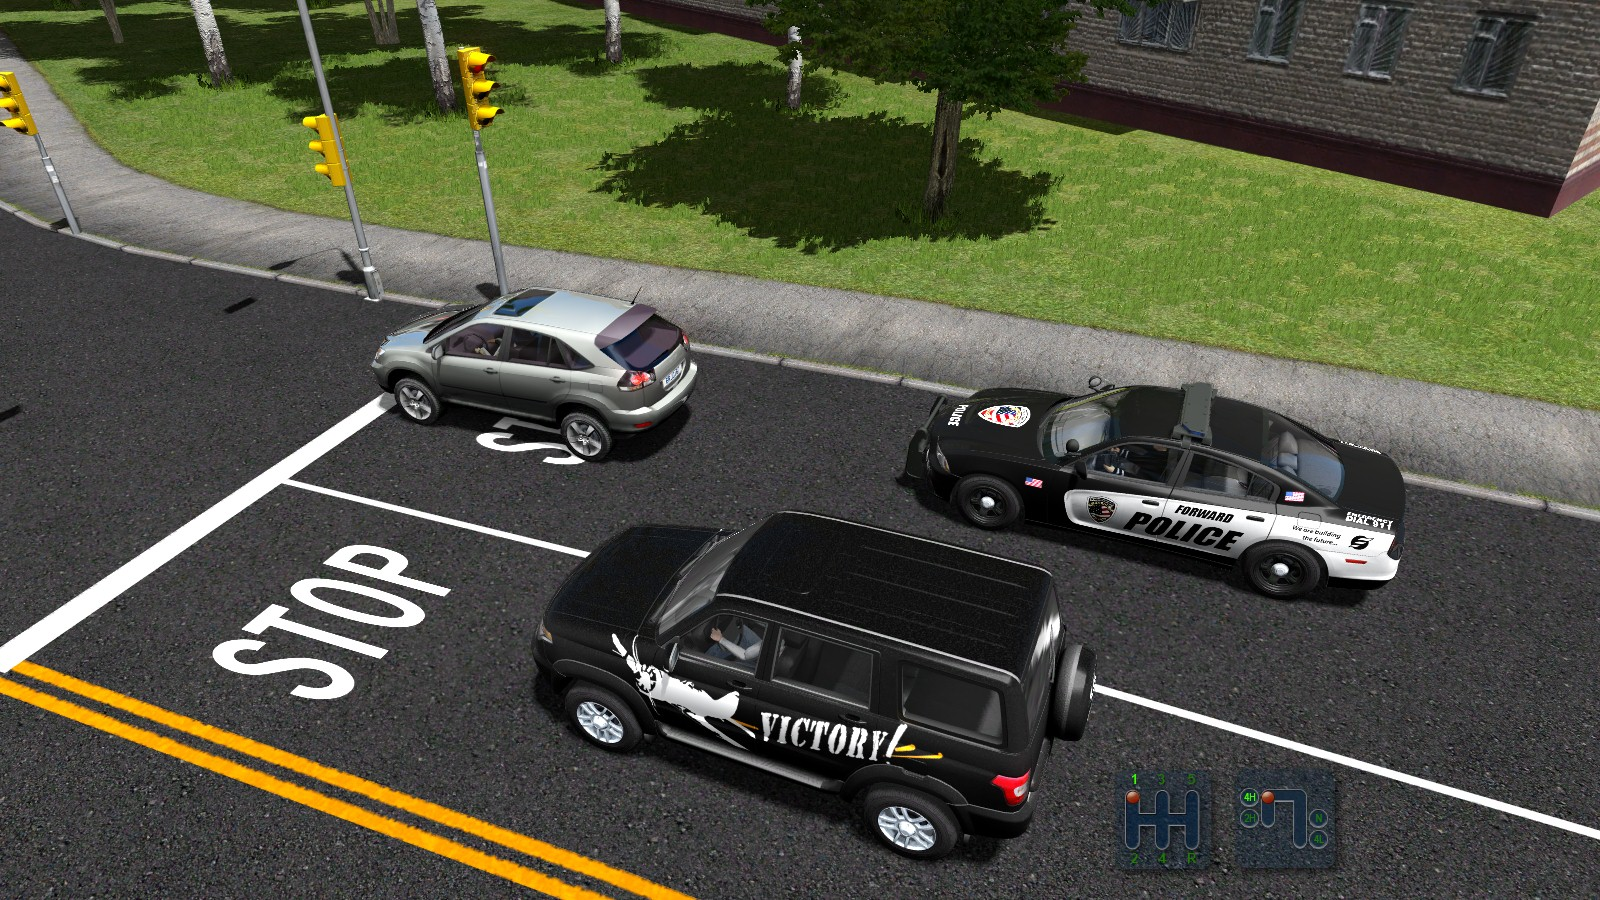 City Car Racing Vr Mode